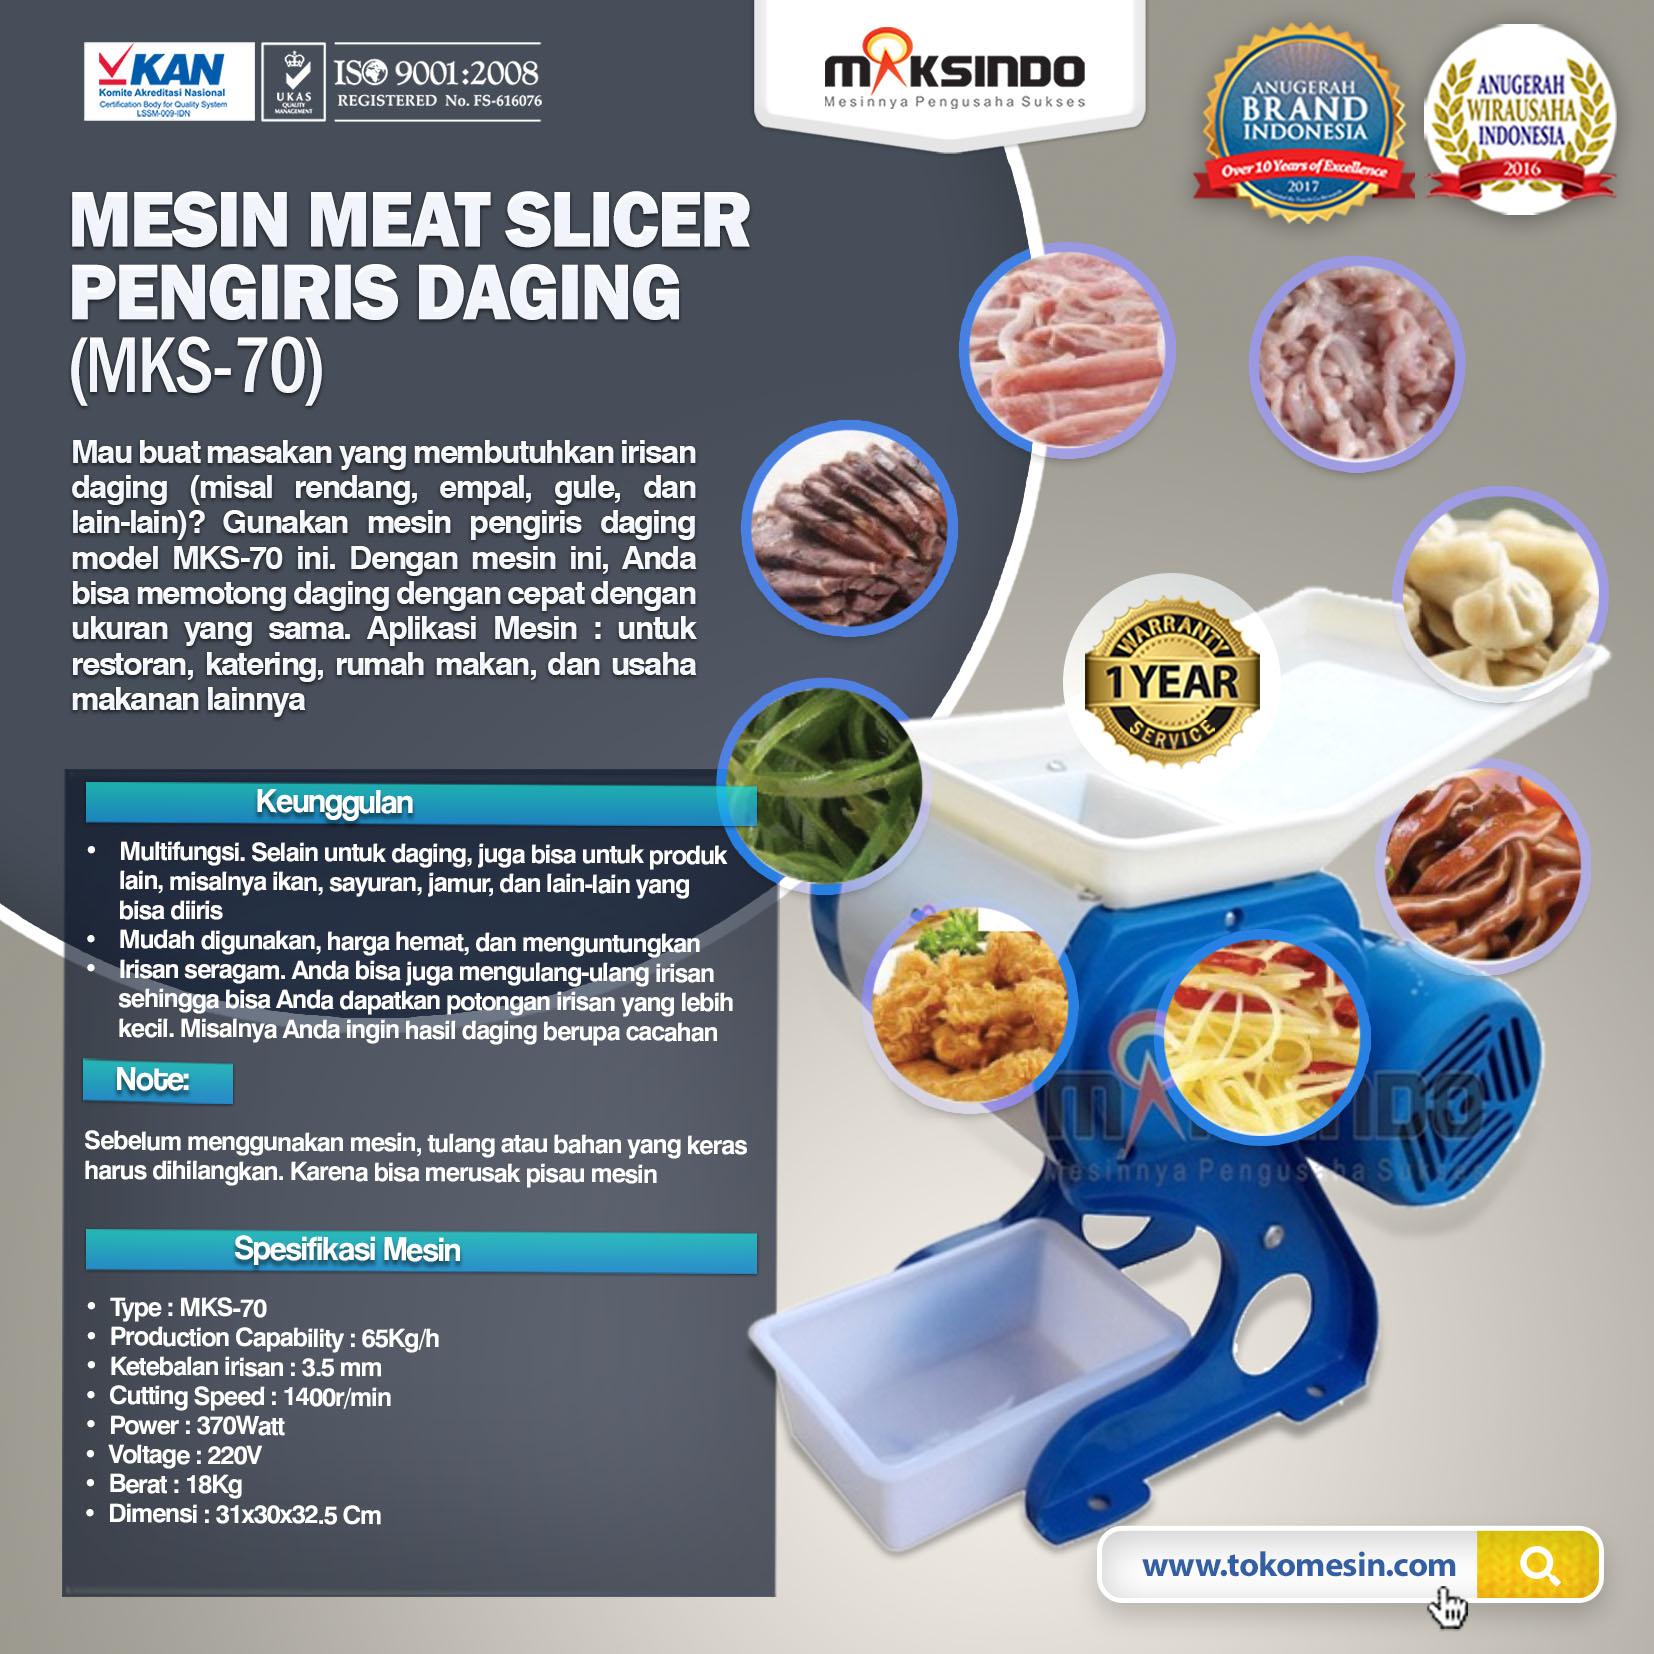 Meat Slicer Pengiris Daging – MKS-70